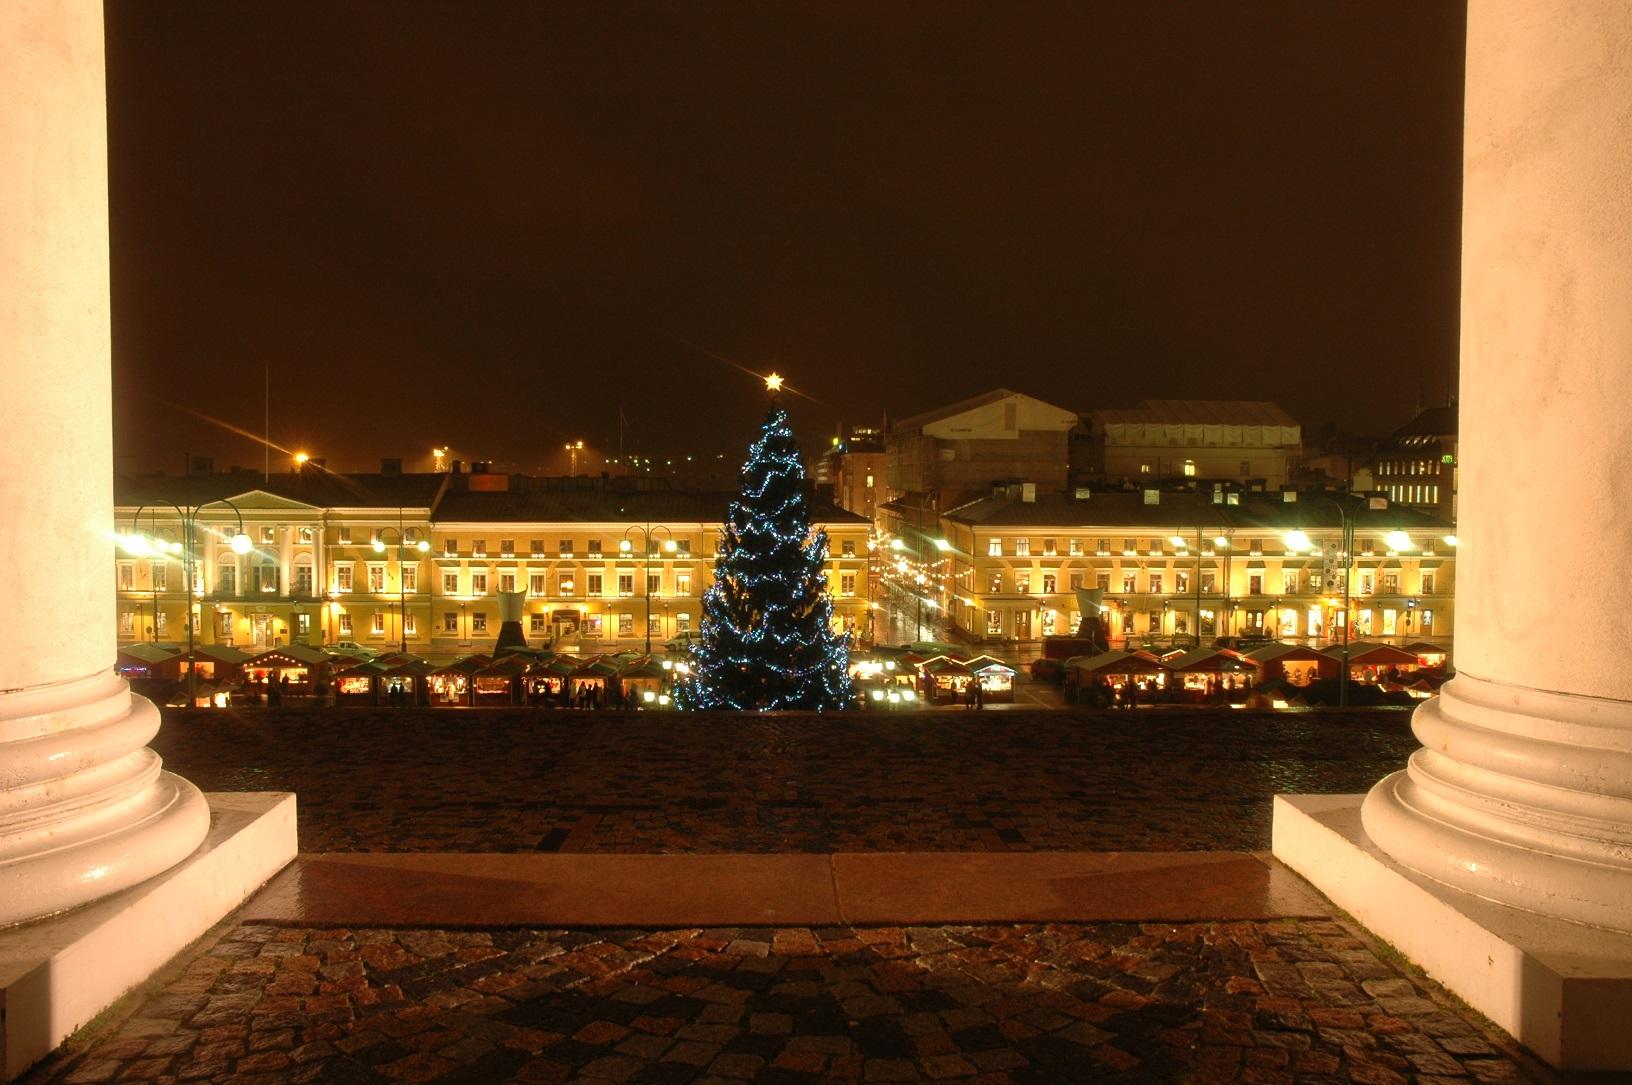 Senaatintori Helsinki im Winter